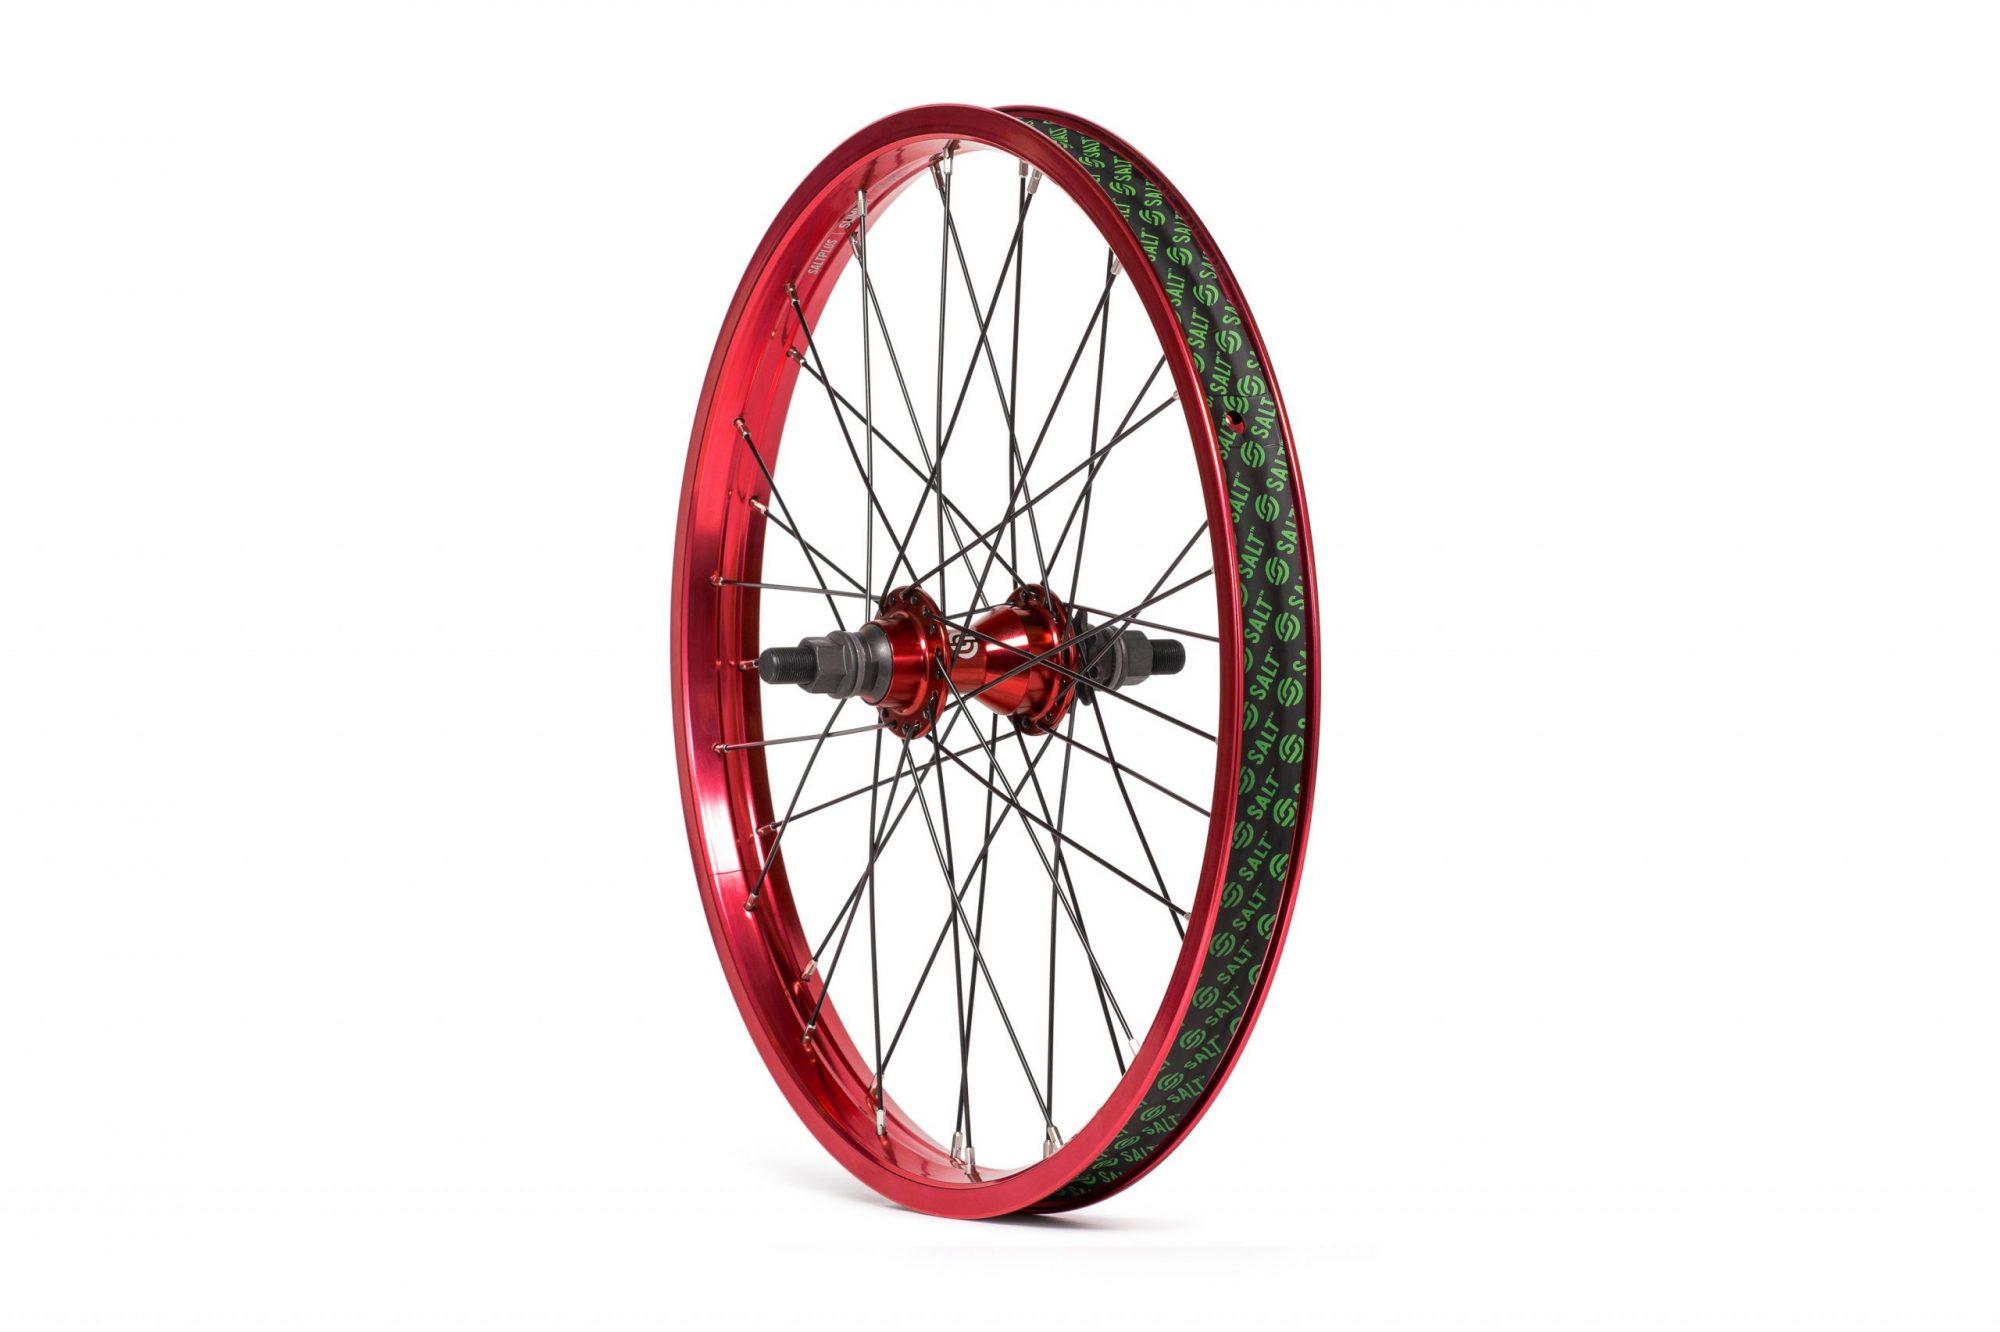 Salt_Everest_CS_rear_wheel_red_01